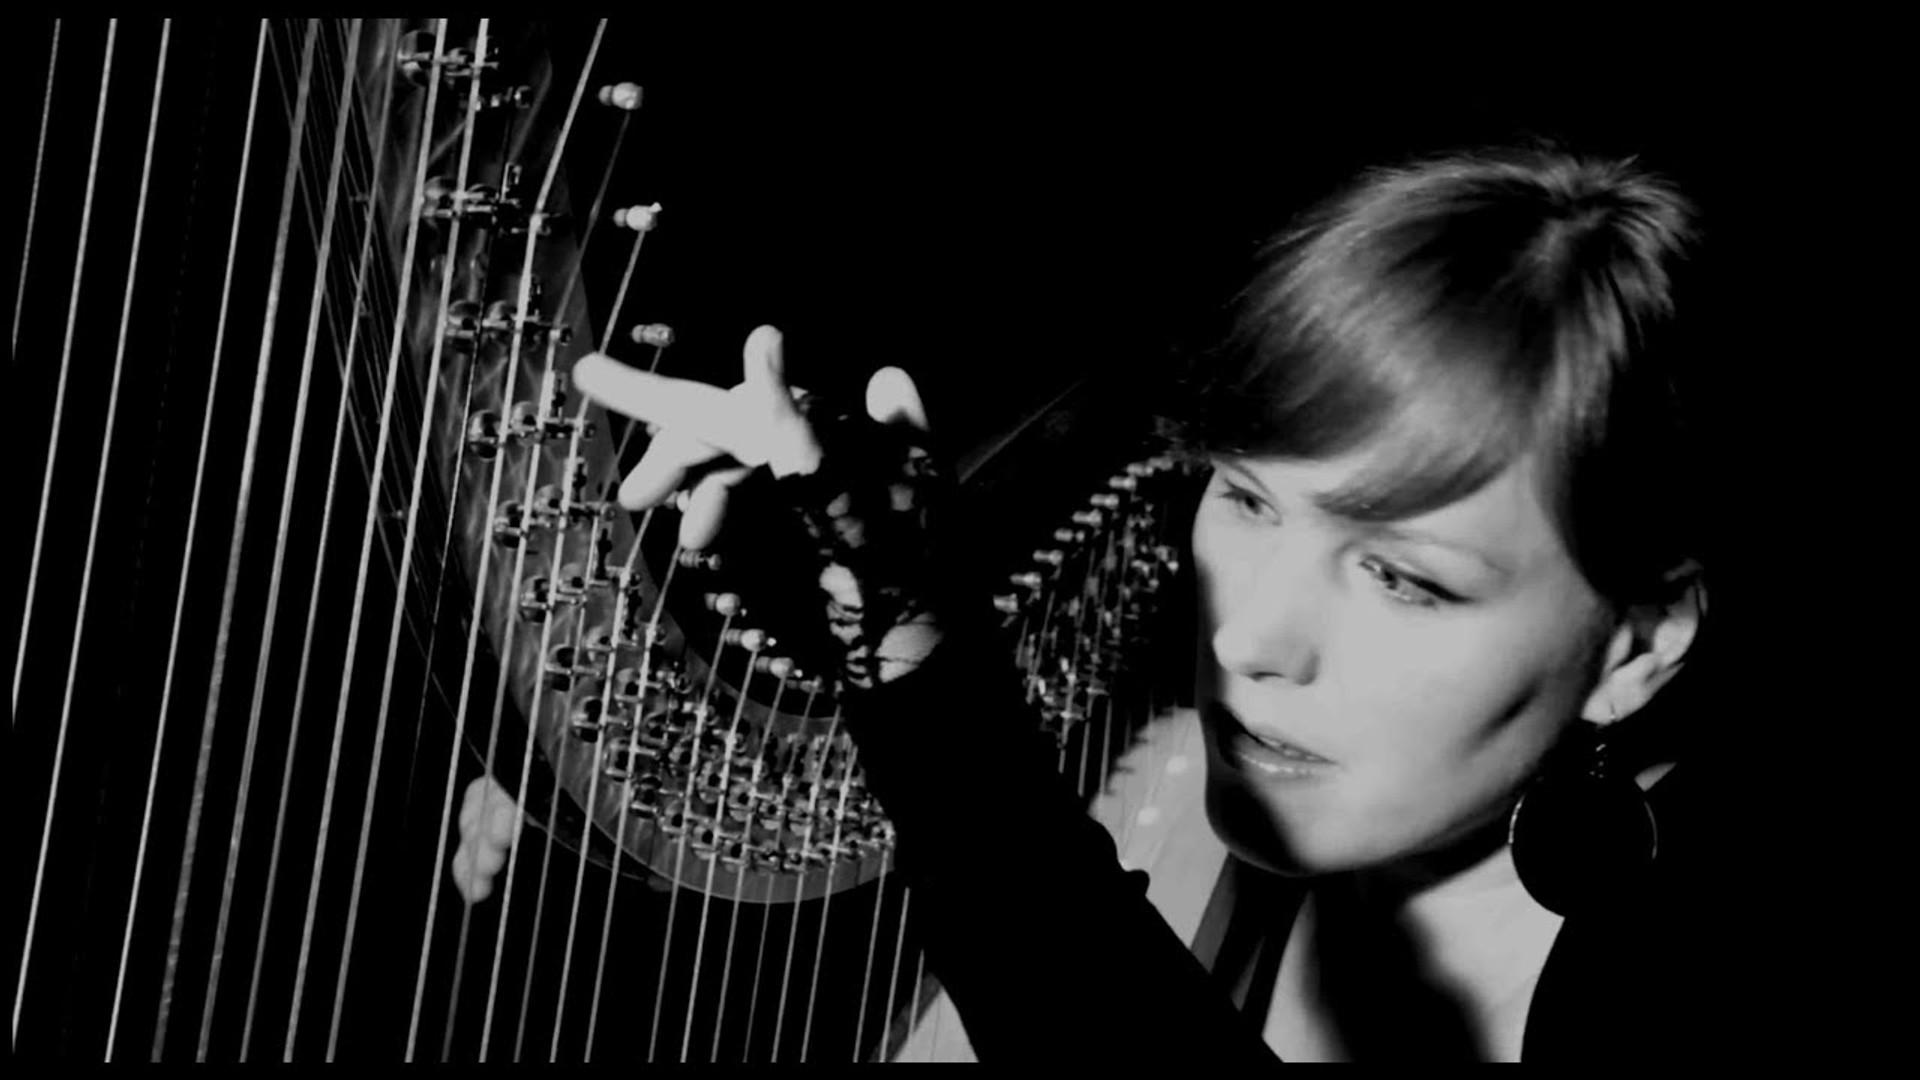 ft. Saskia Laroo © (harp and soul production house)